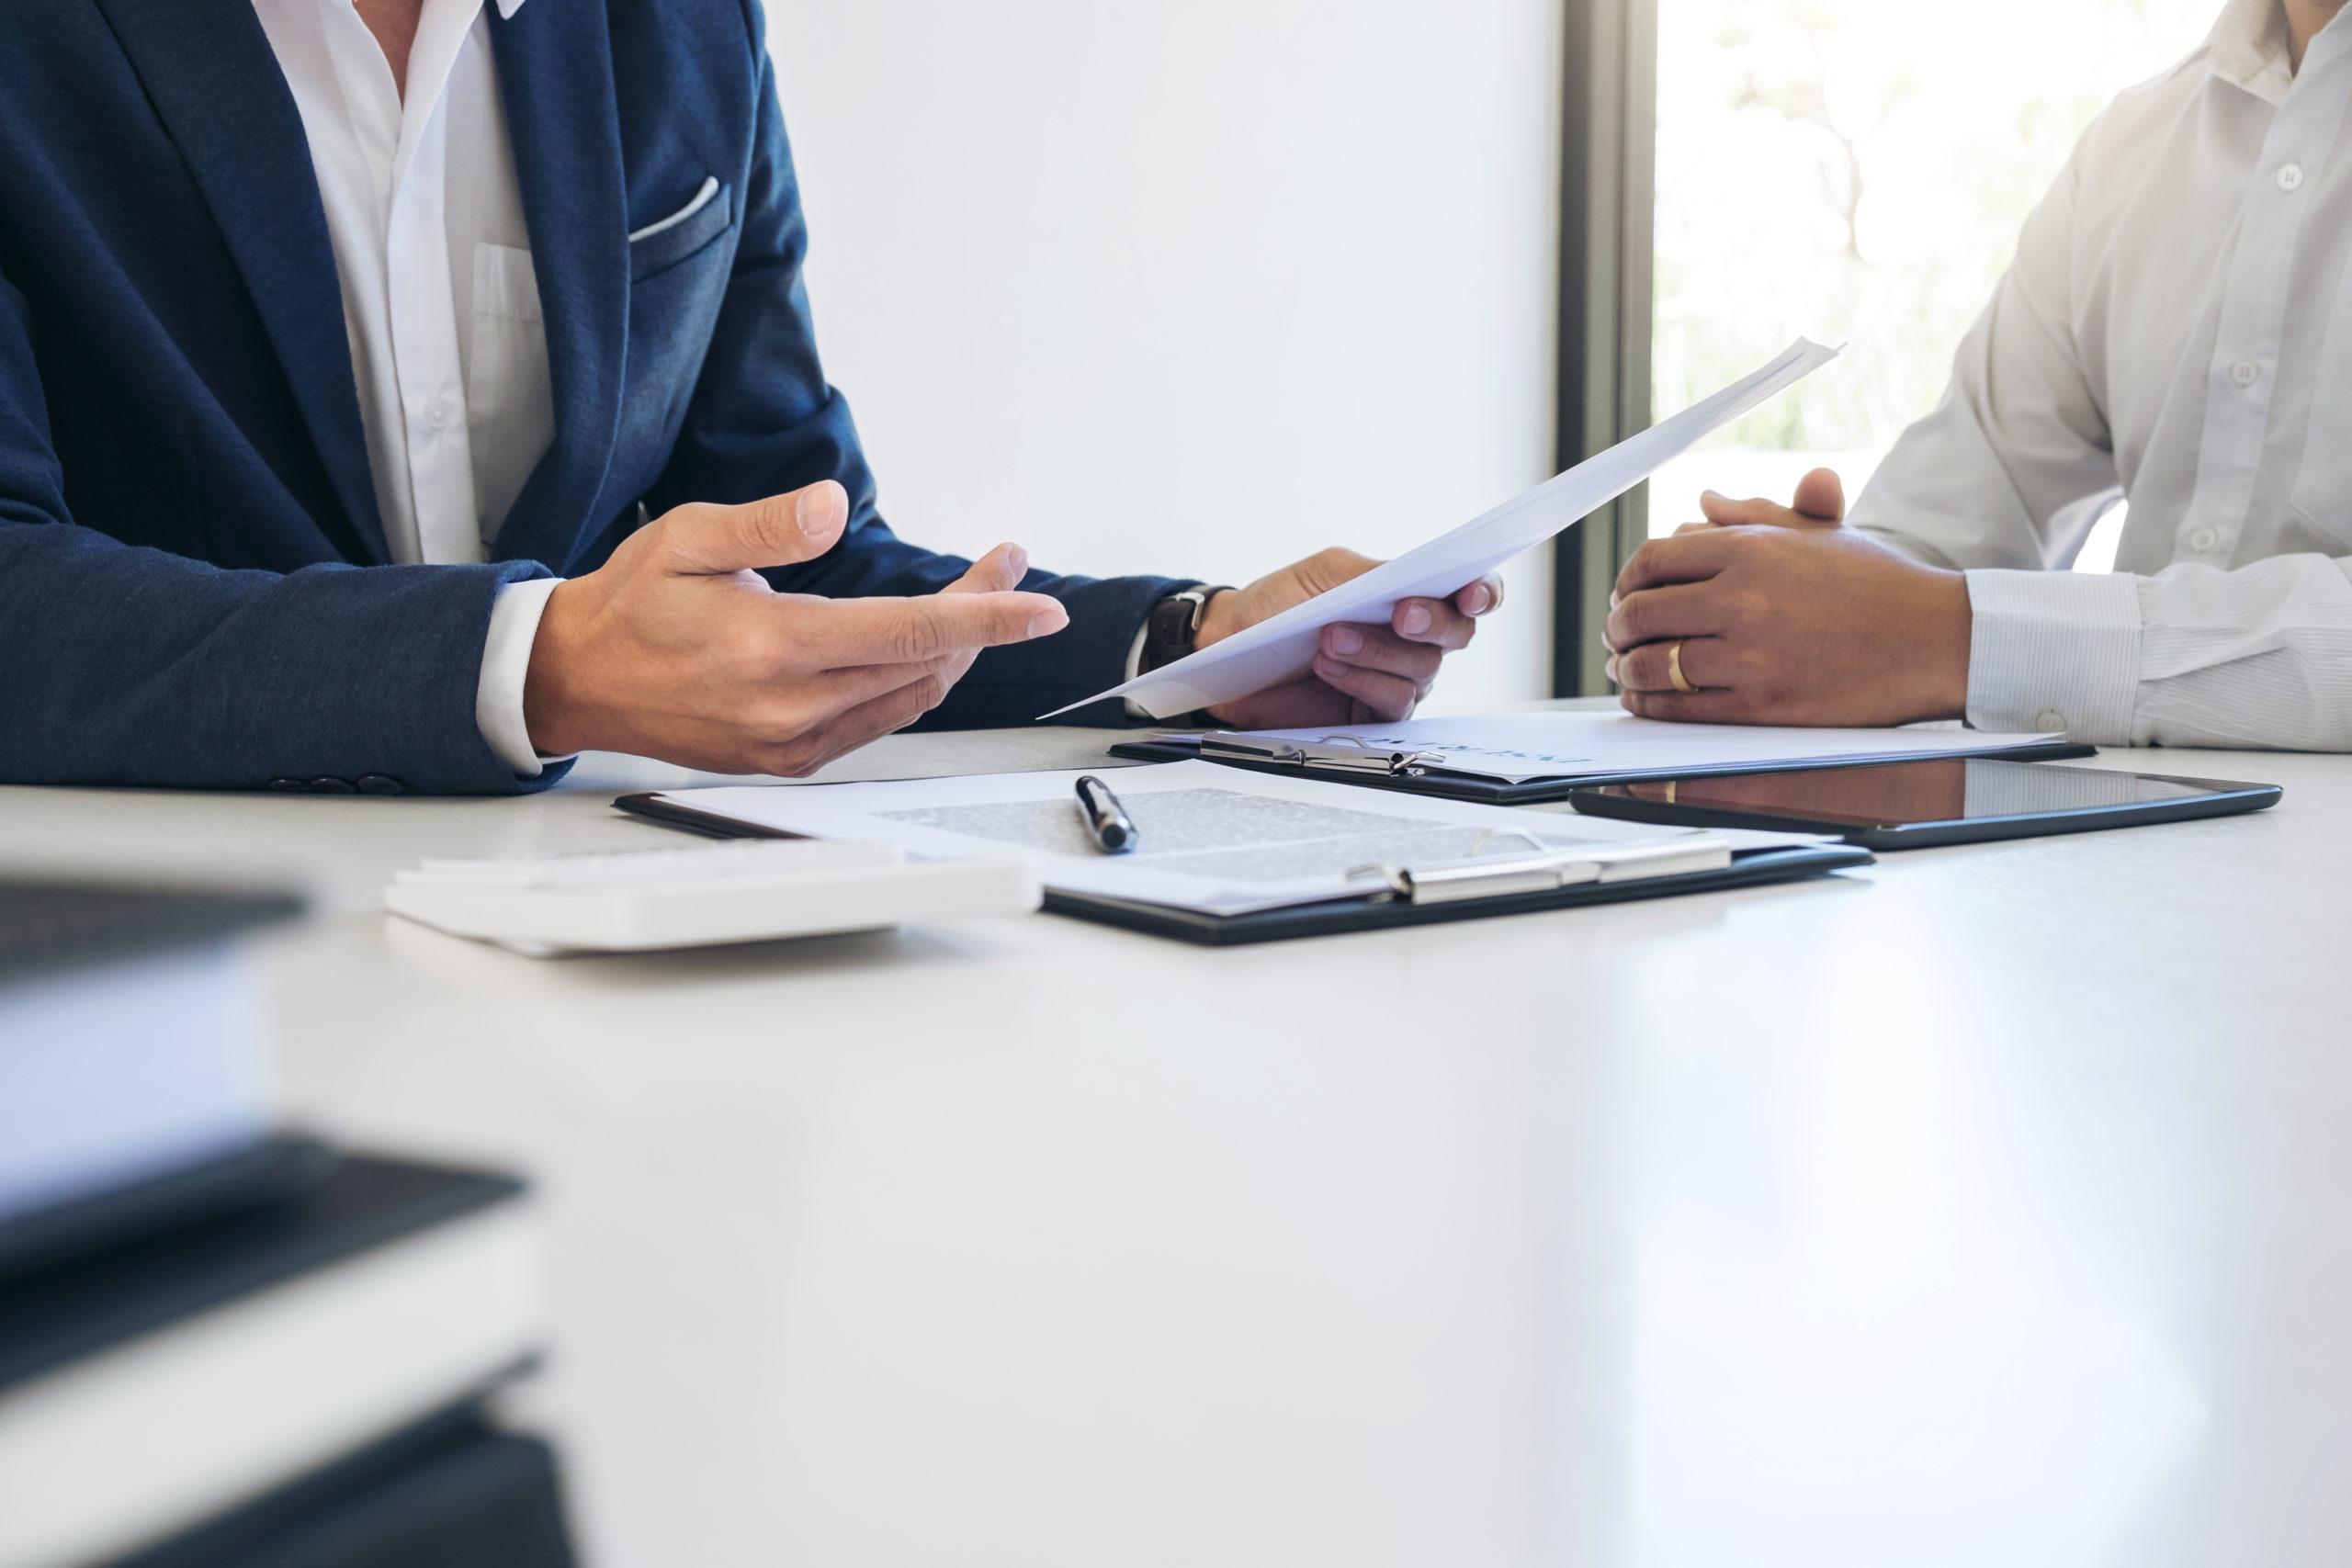 Geschäftsmann diskutiert Vertrags Details mit Kunden